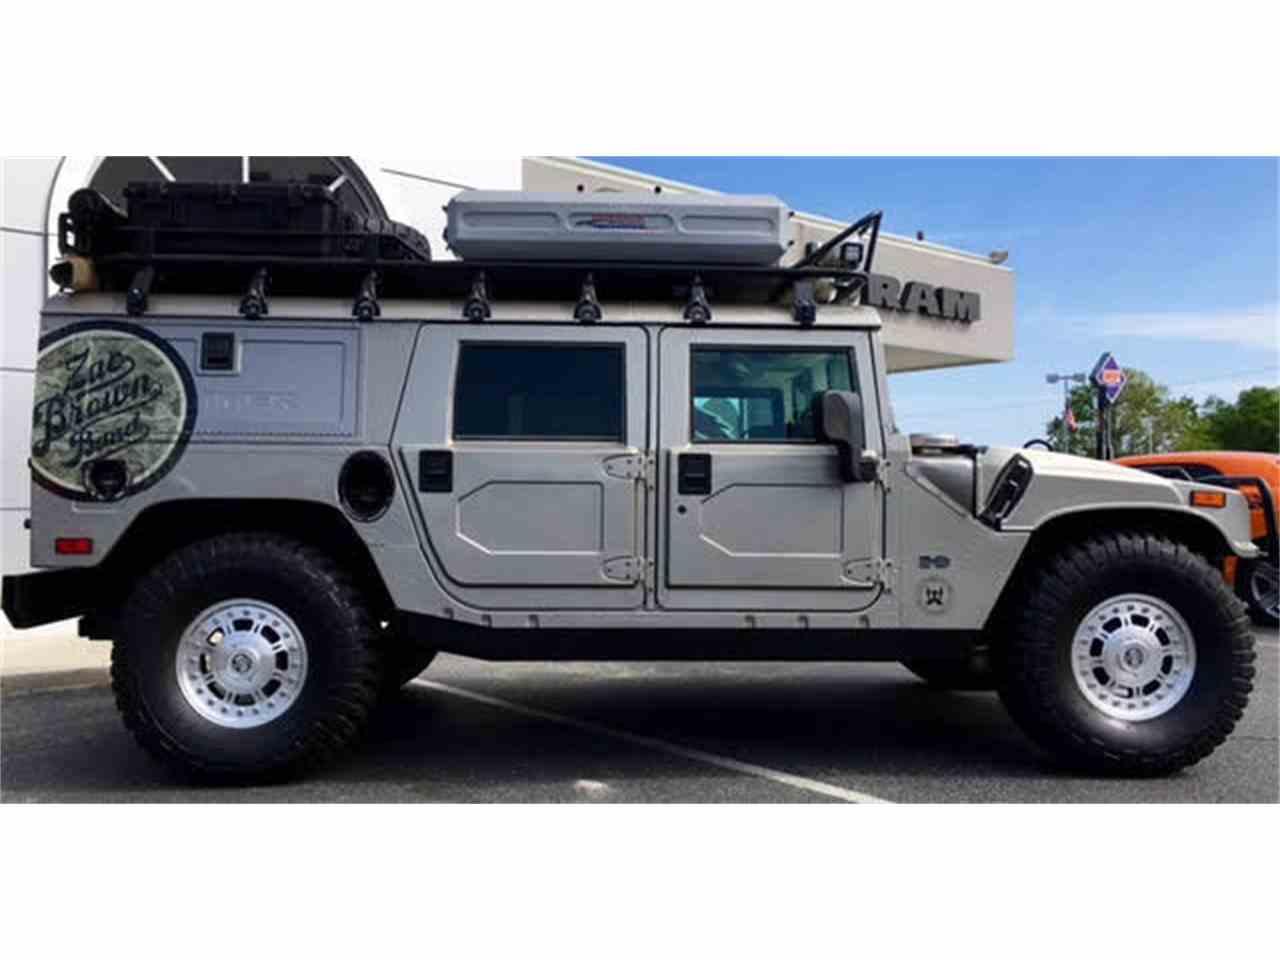 Hummer 2004 hummer h1 : 2004 Hummer H1 HMCS MP ZAC BROWN CUSTOM for Sale | ClassicCars.com ...